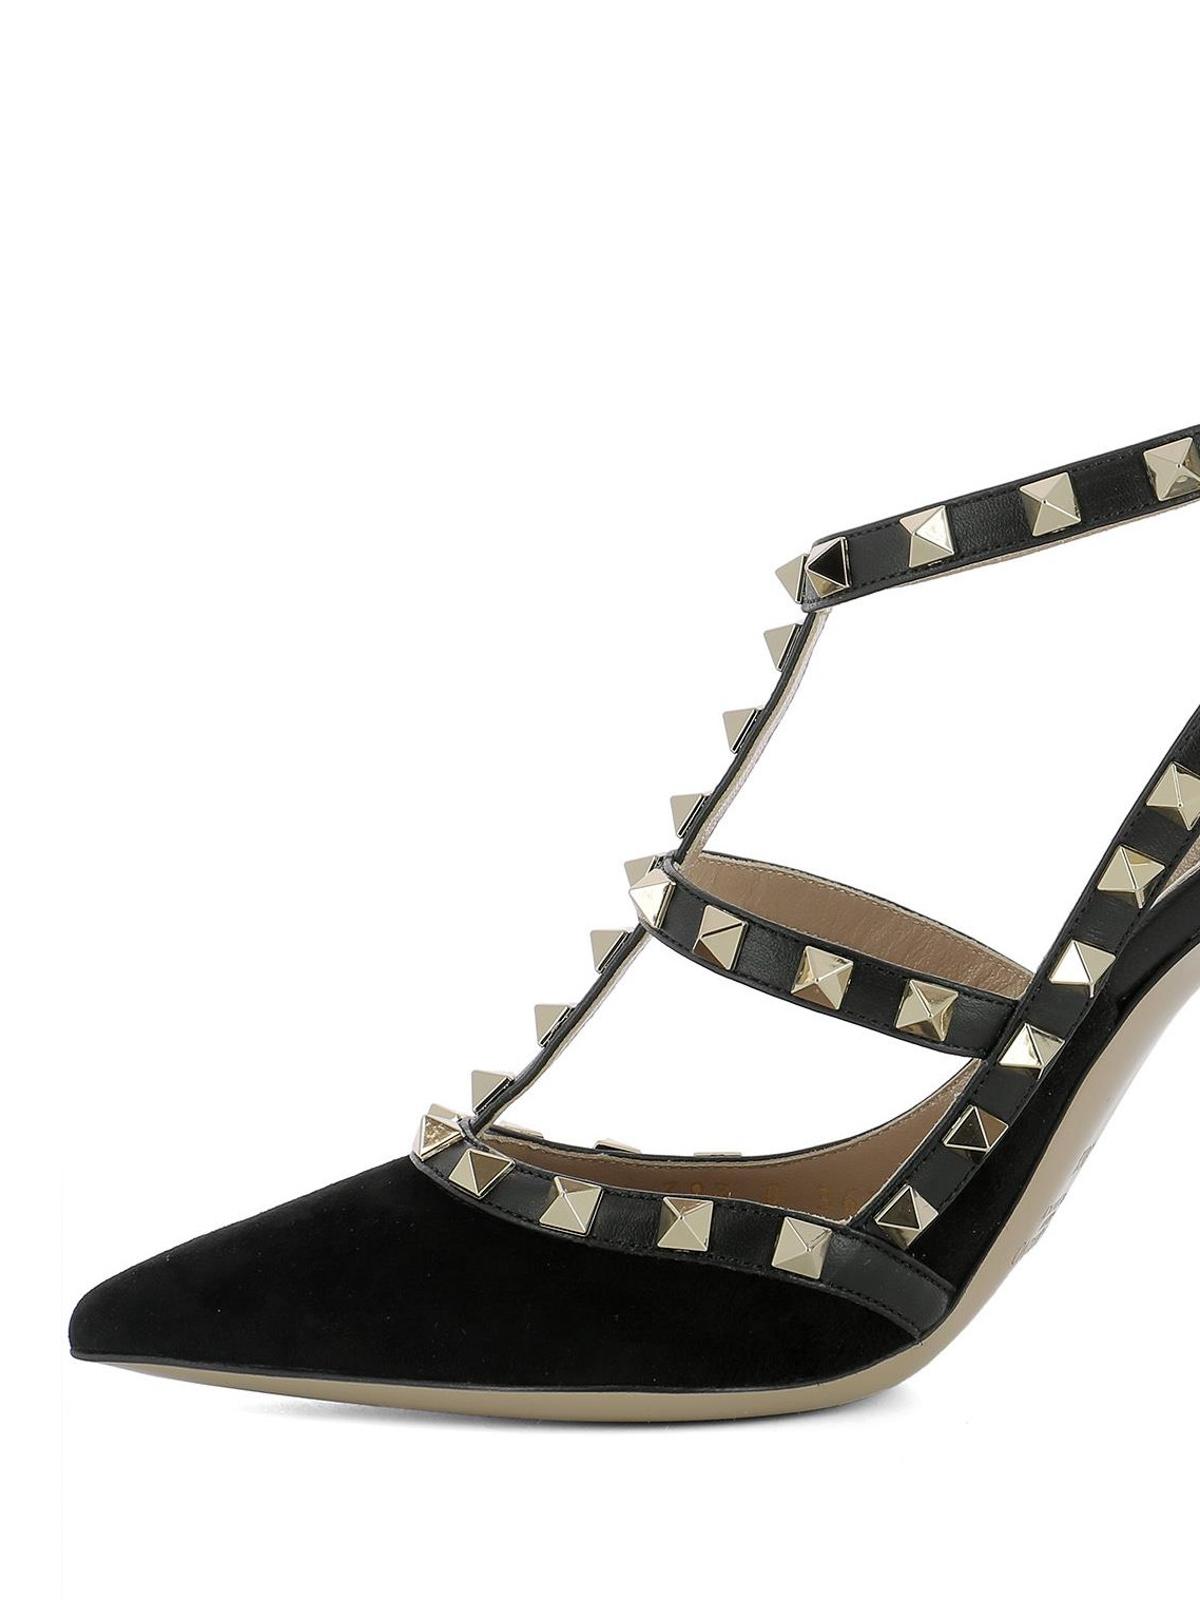 ccbd4ef14bf iKRIX VALENTINO GARAVANI  court shoes - Rockstud black suede pumps